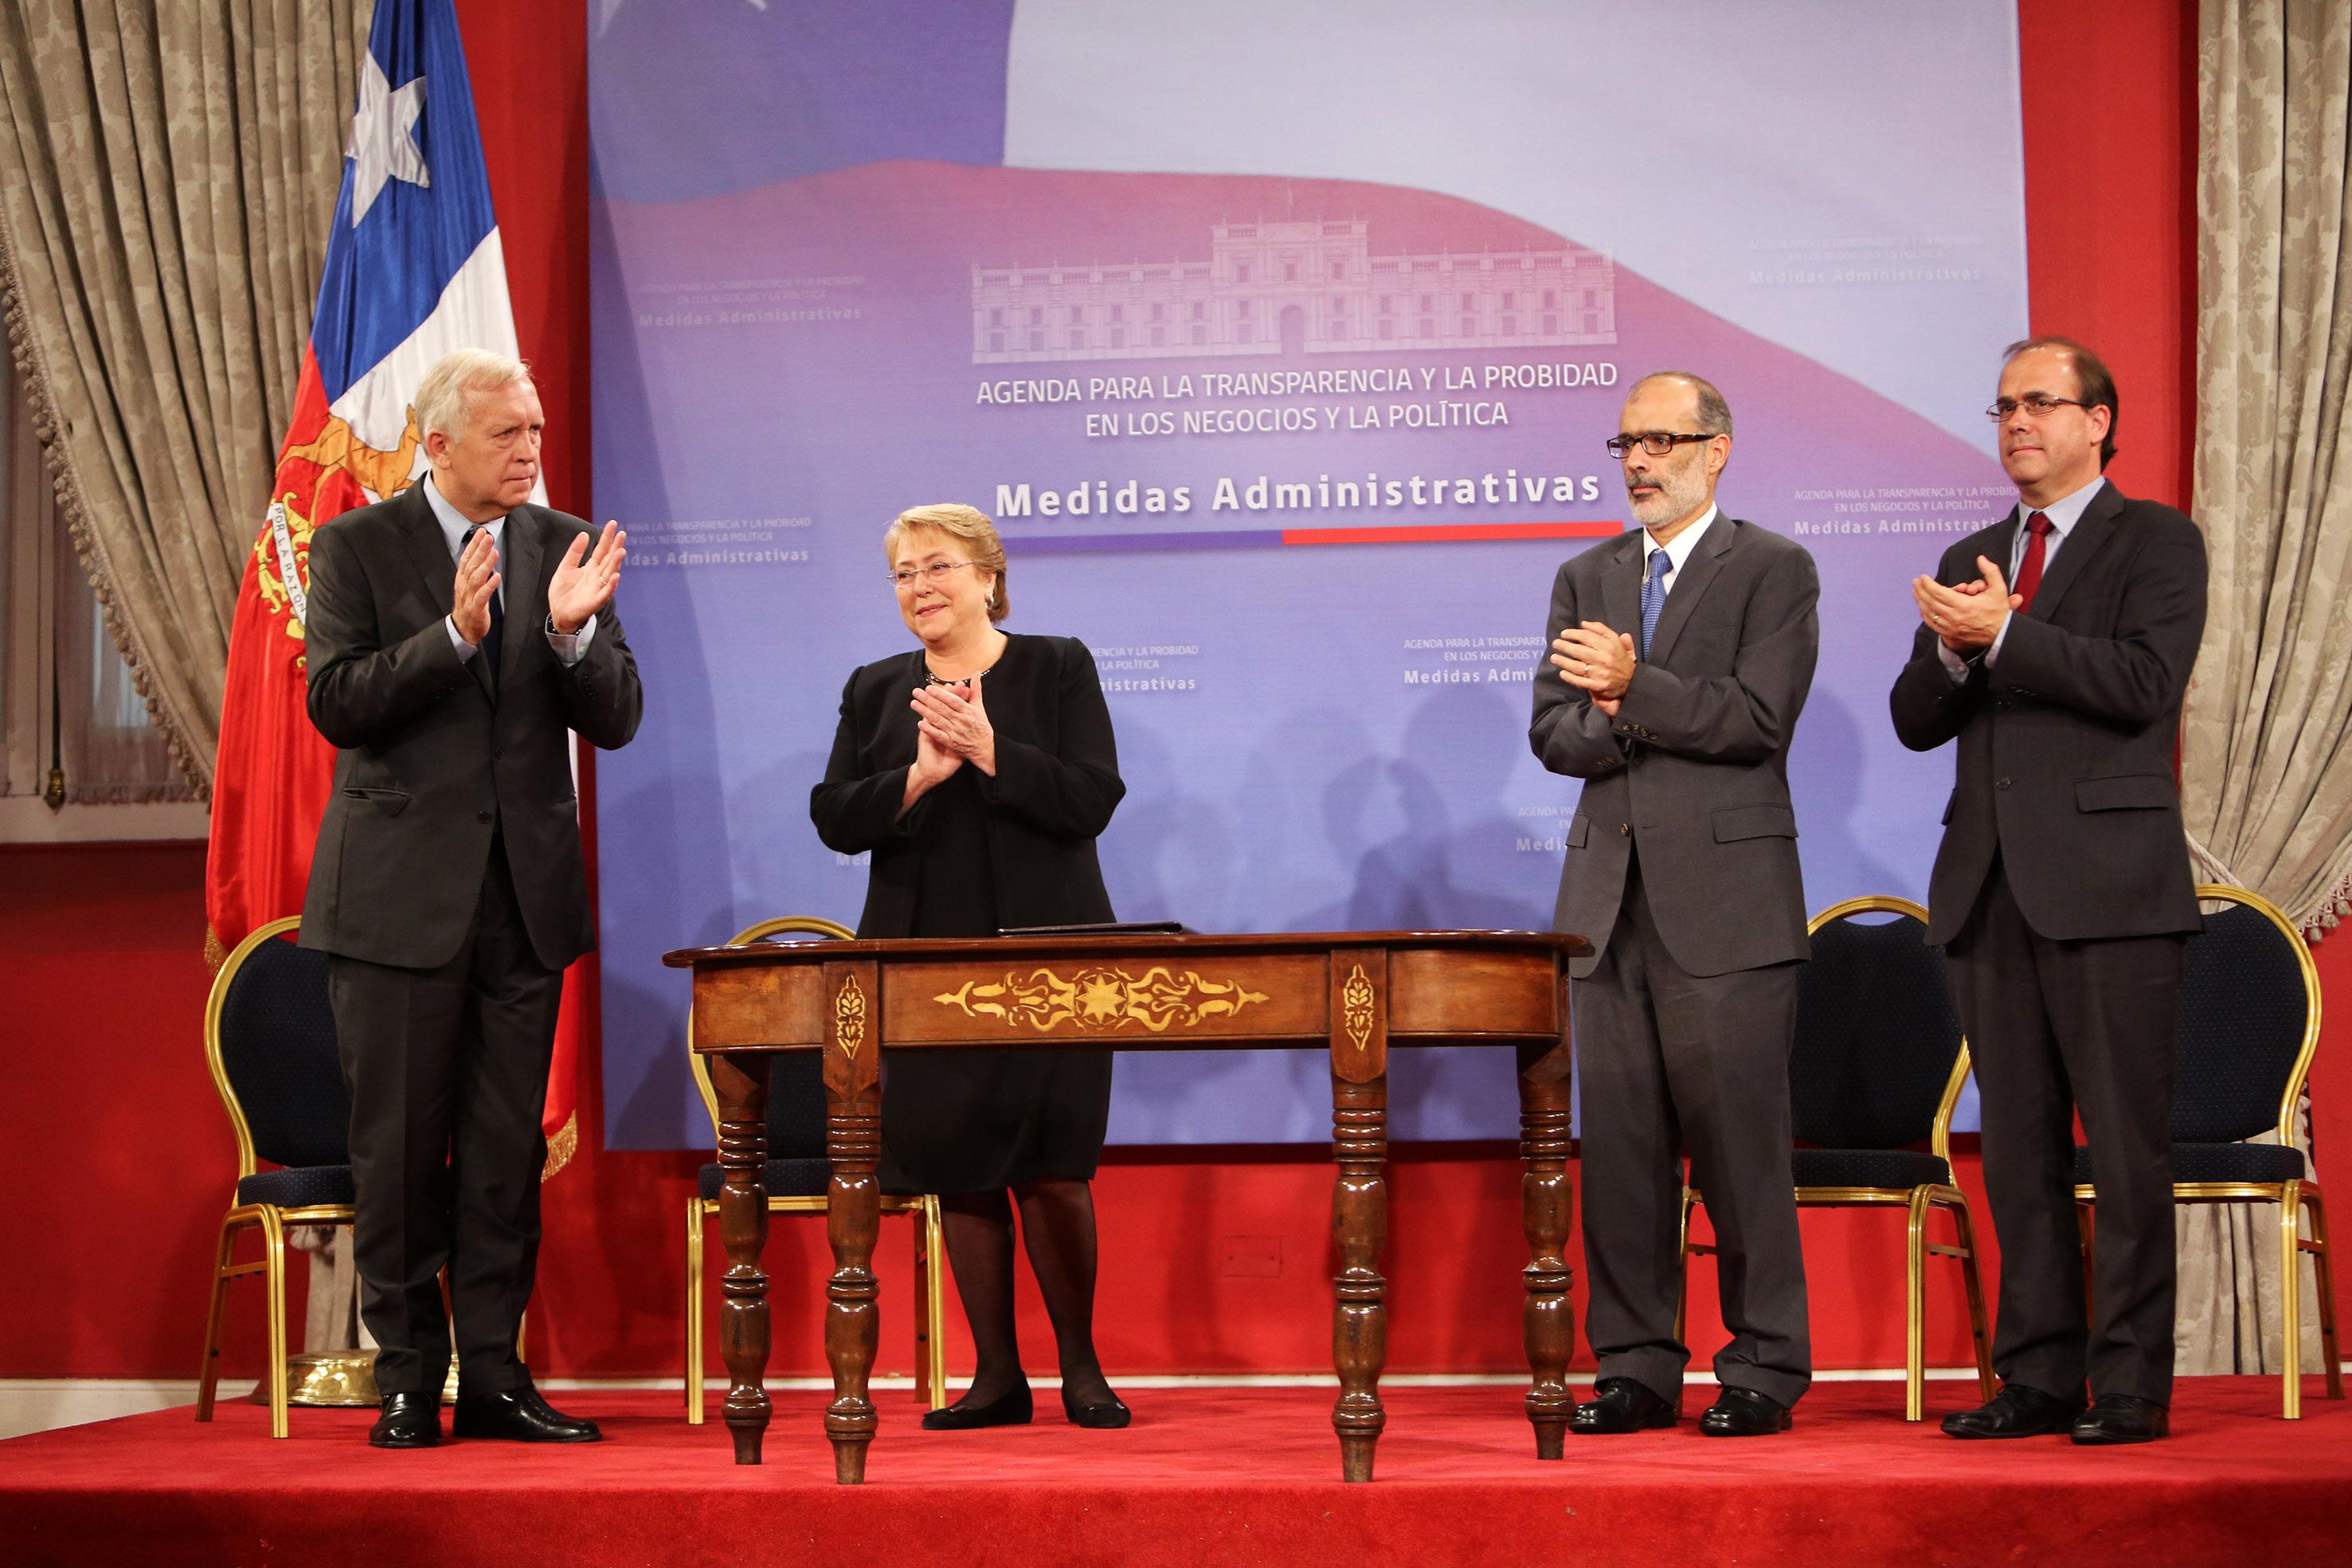 presidenta bachelet anunci cumplimiento de medidas